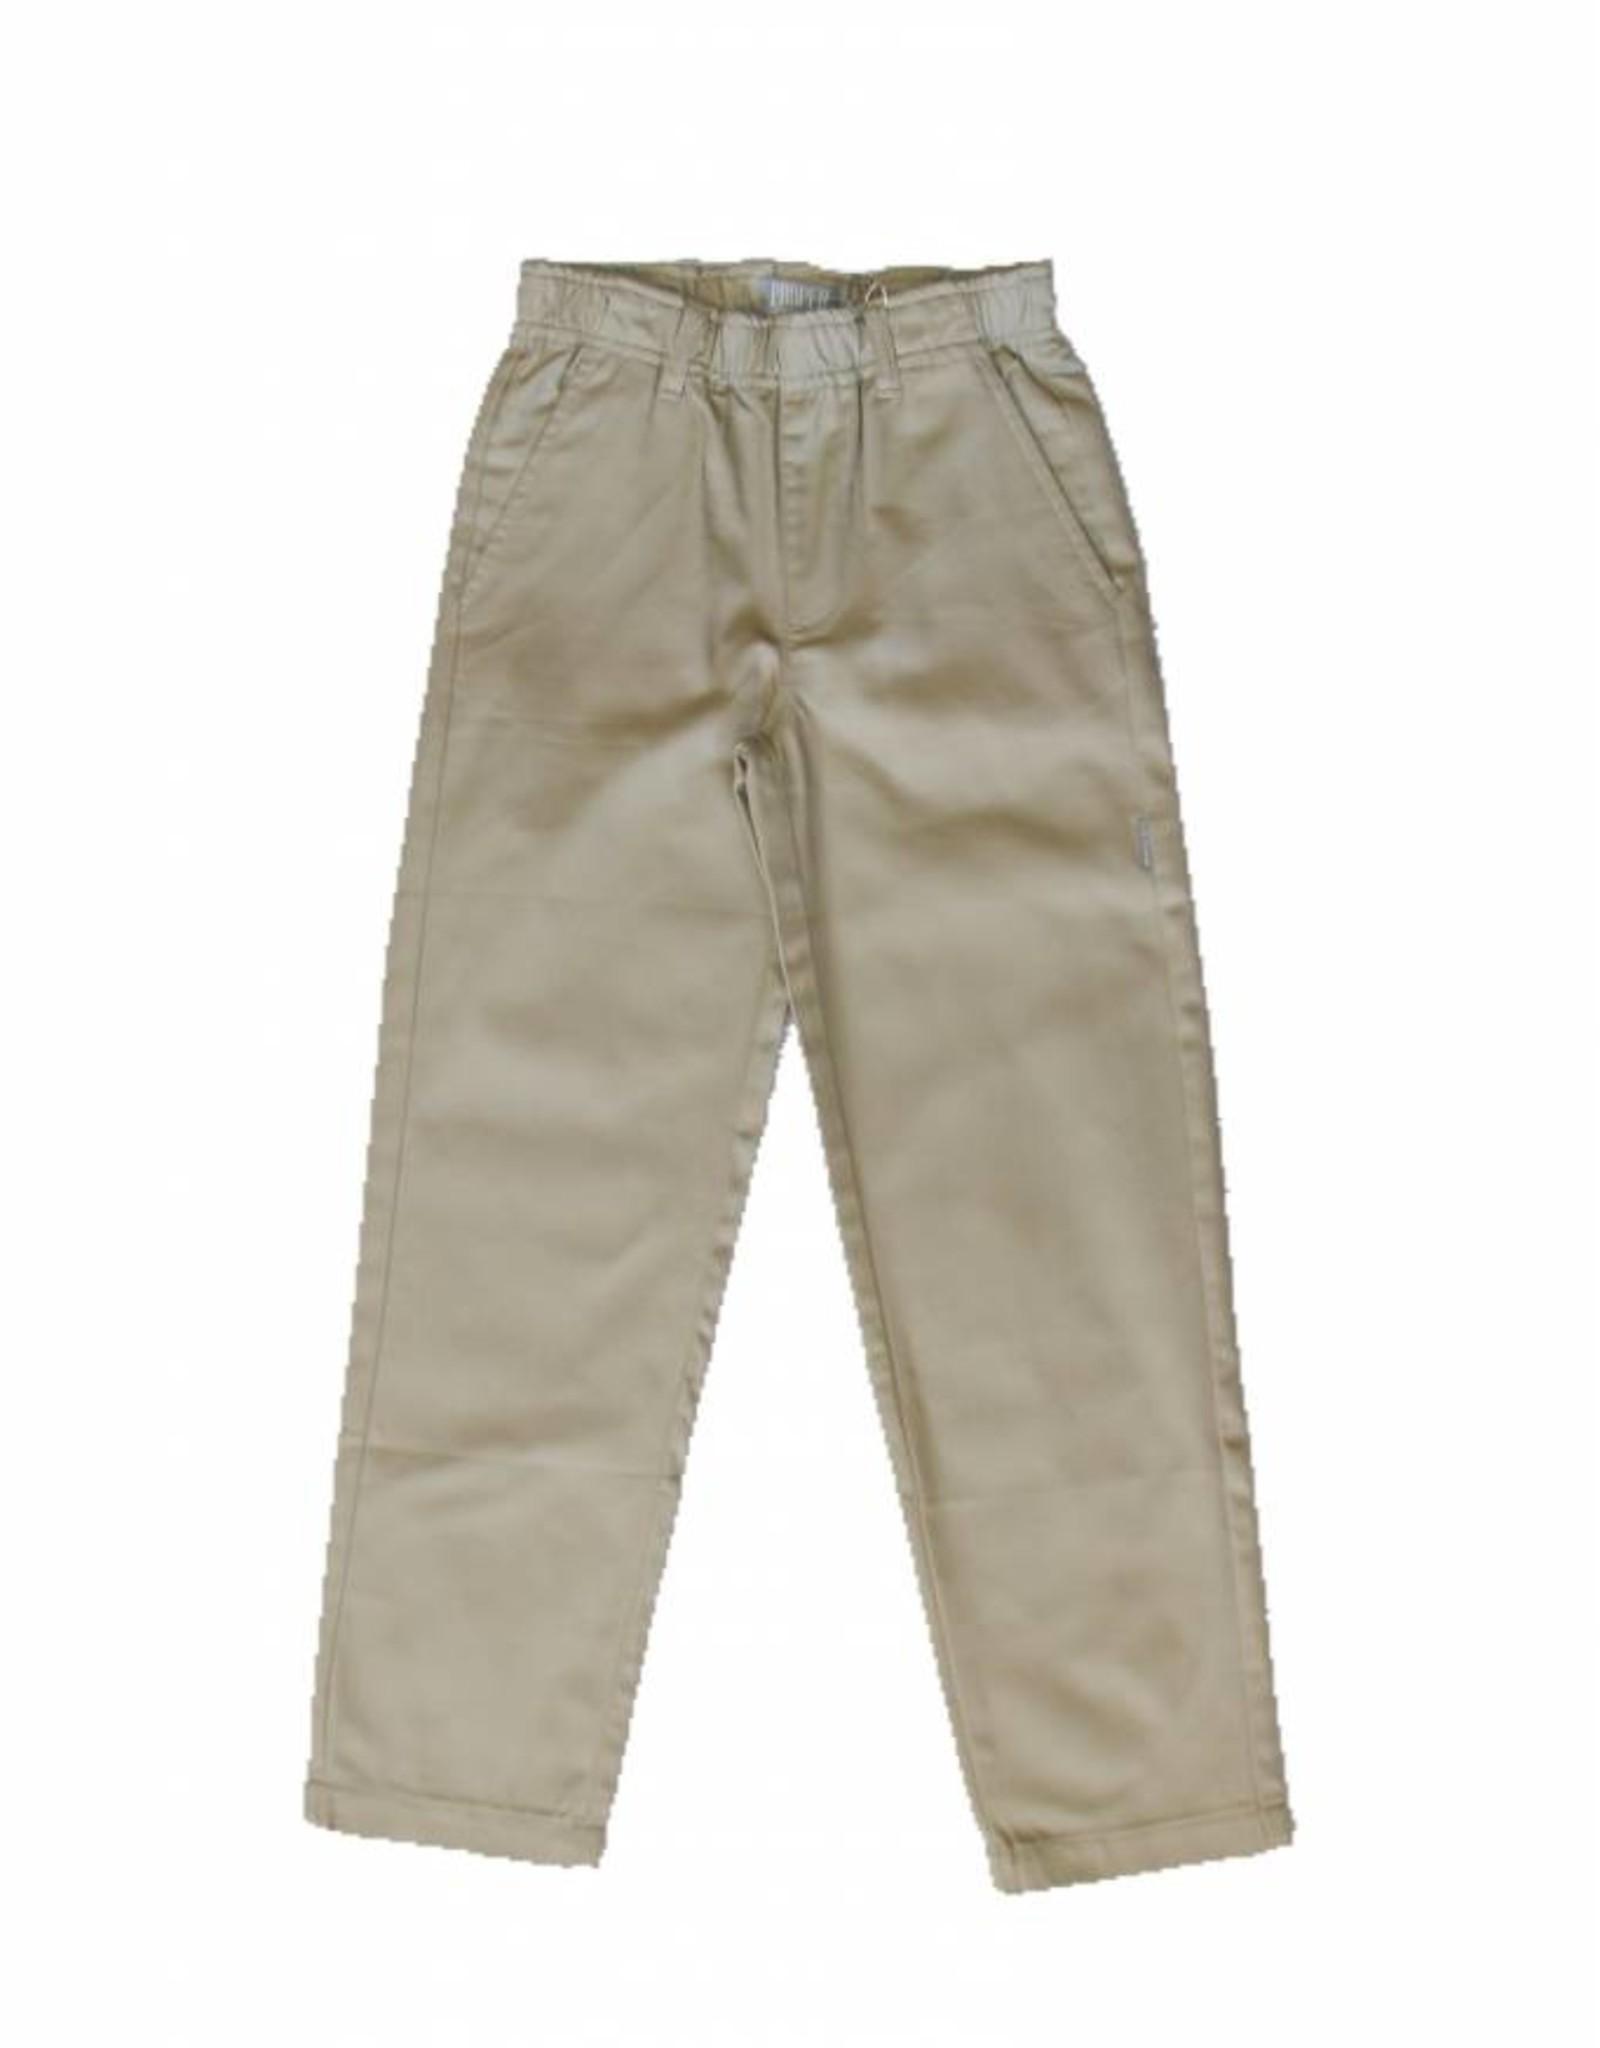 Pants Youth Khaki with Elastic